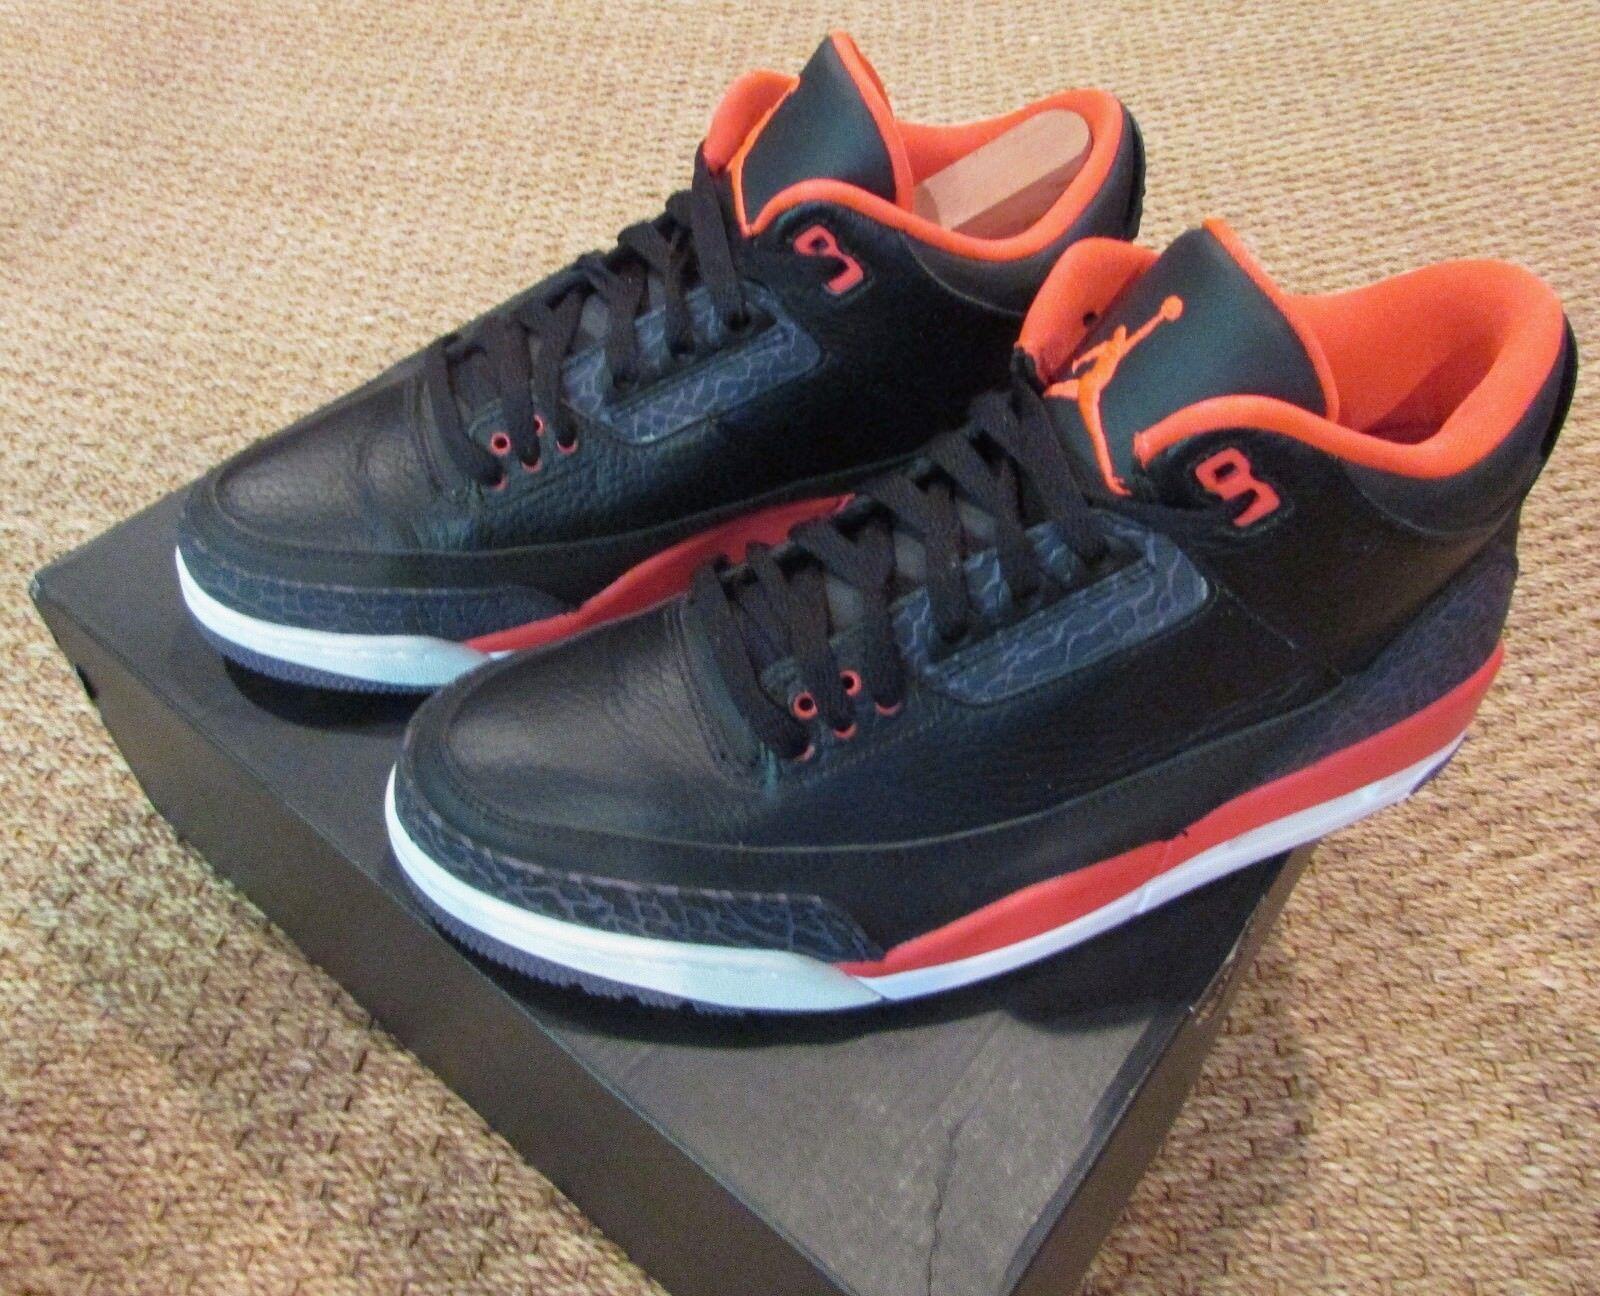 Nike Air Jordan 3 III Retro Black Crimson 136064-005 Mens shoes SZ 10.5